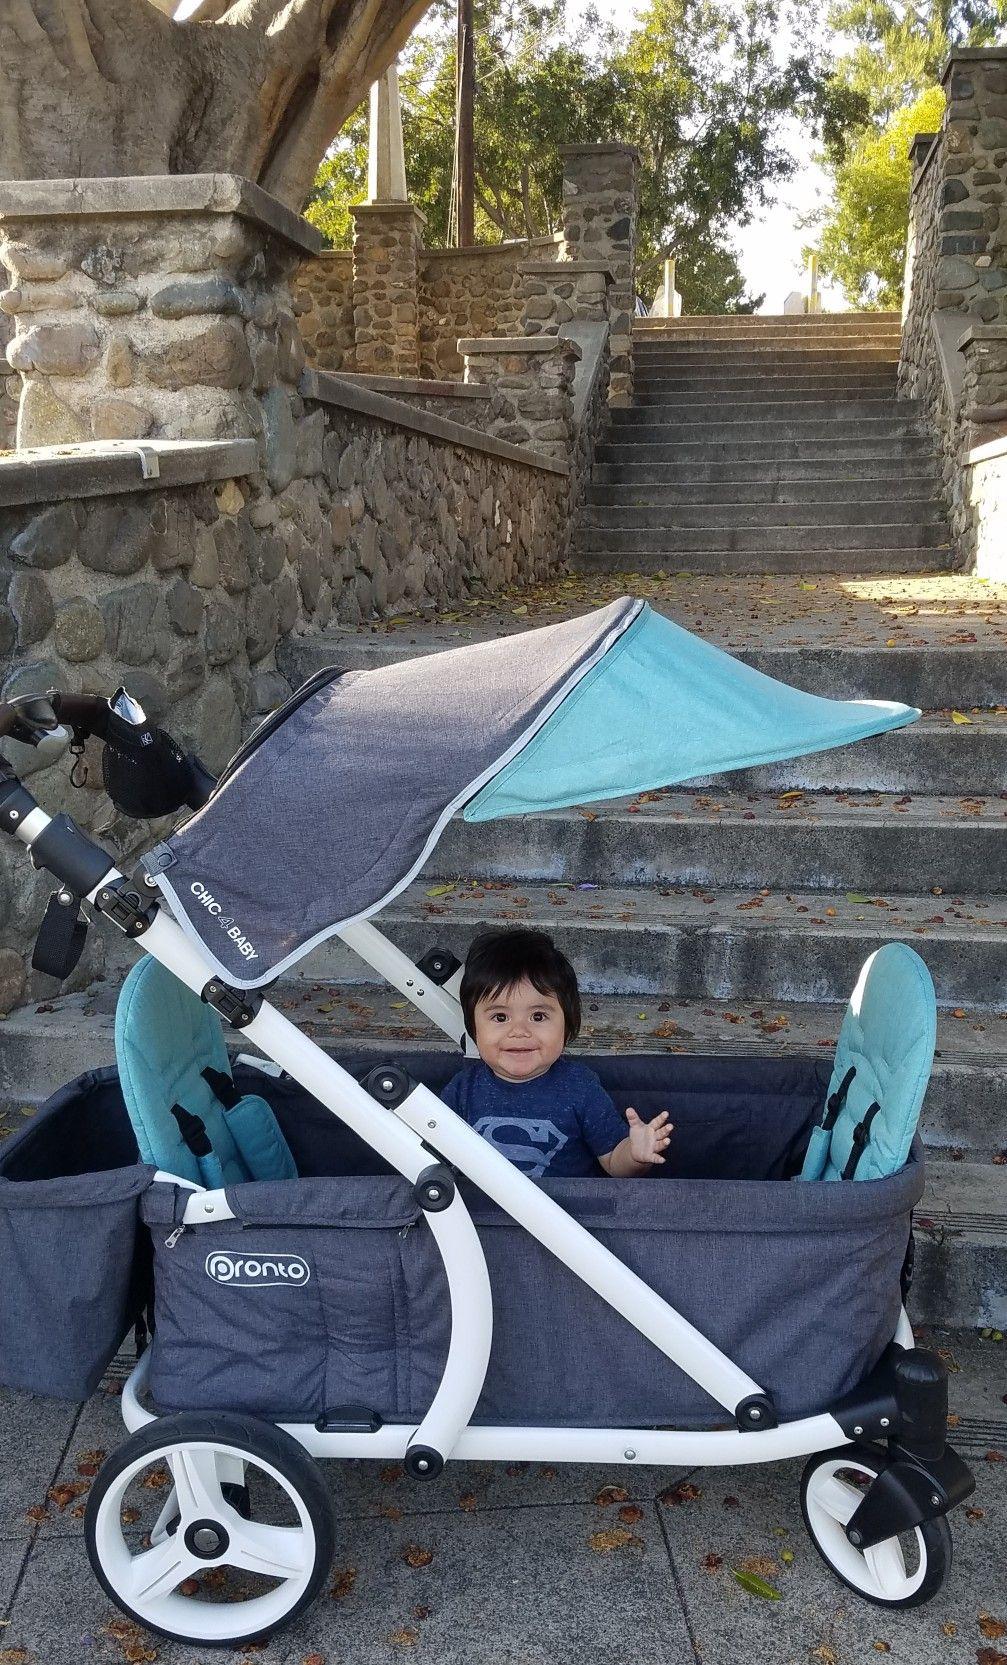 Pronto Stroller Stroller, Luxury stroller, Double strollers